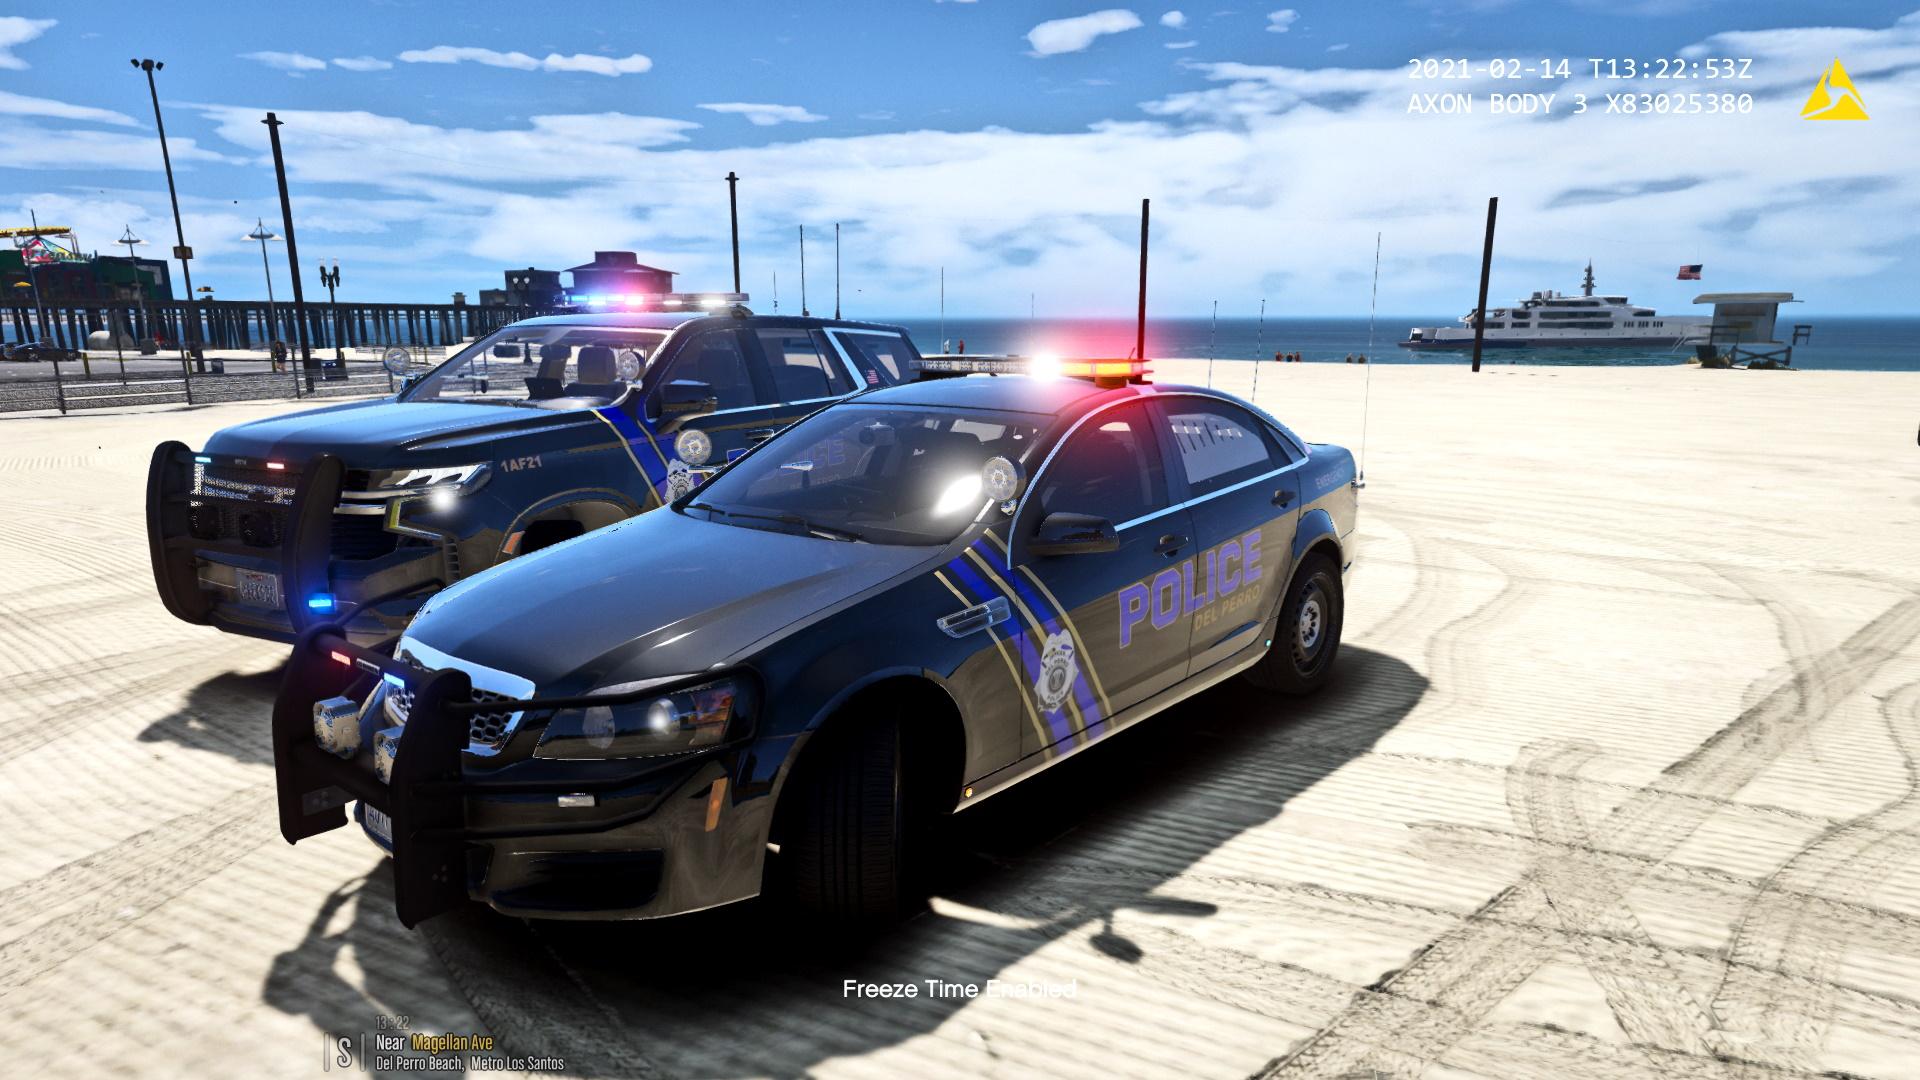 Grand Theft Auto V Screenshot 2021.09.21 - 20.11.49.06.jpg